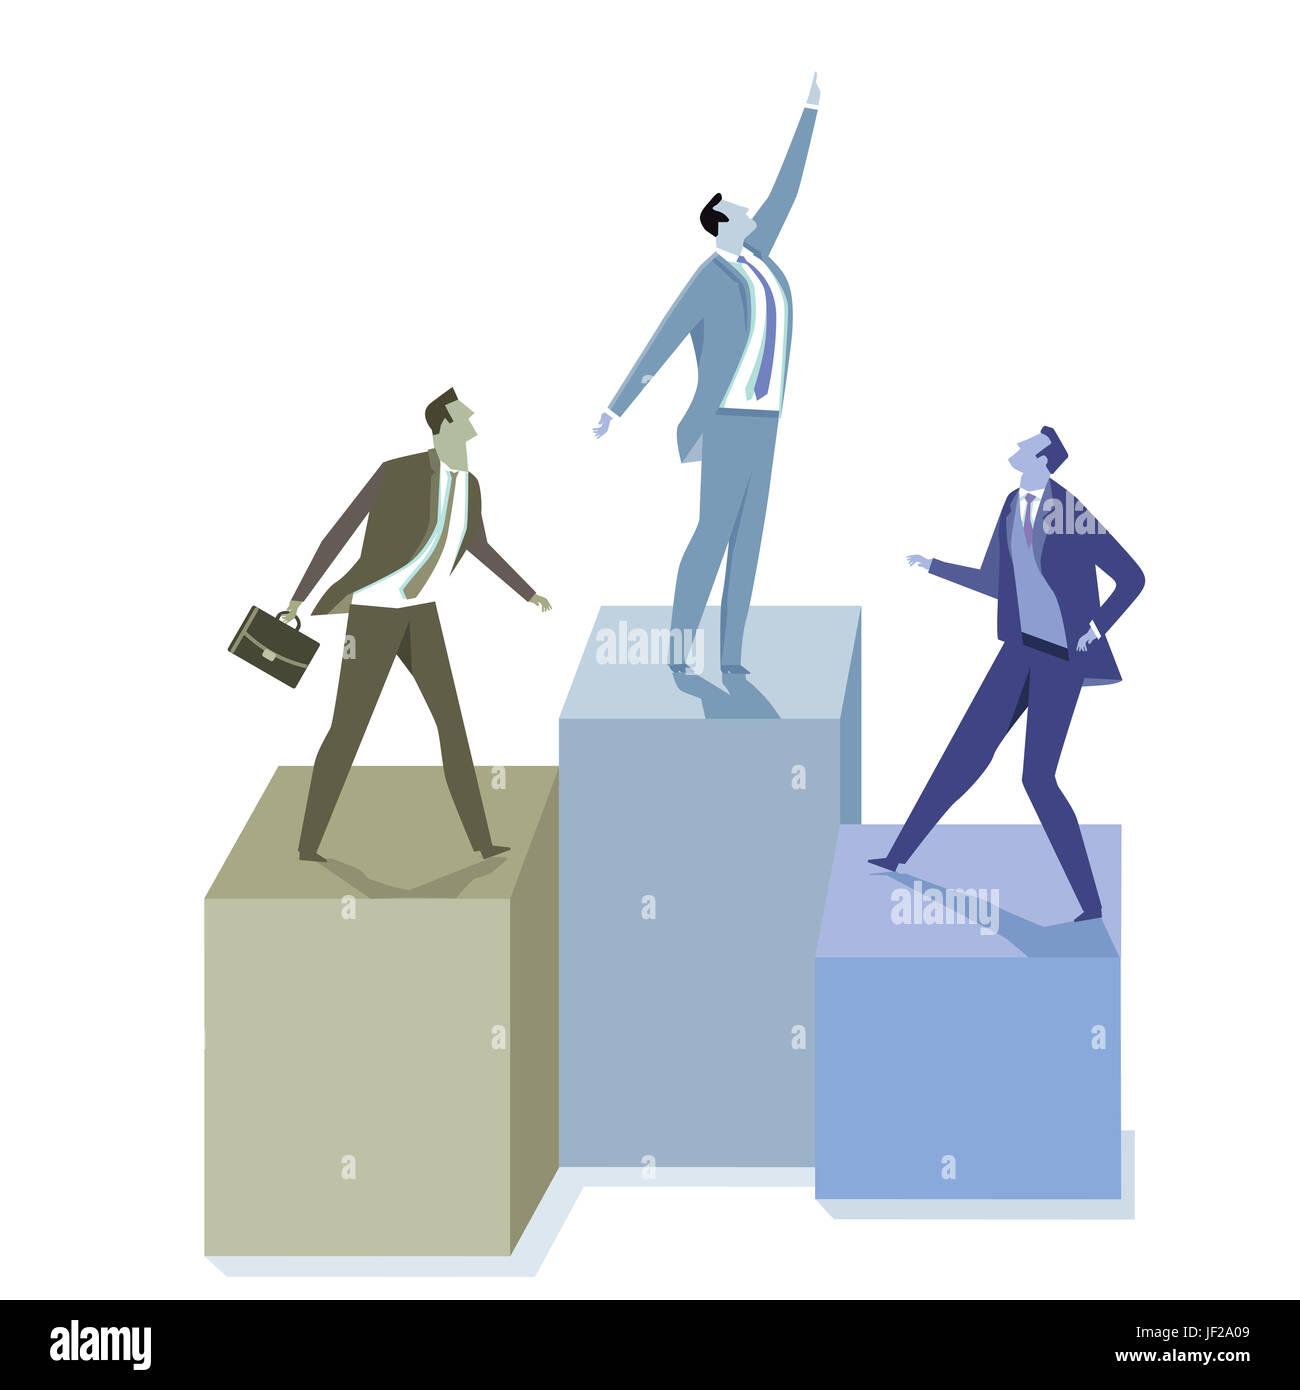 Business development infographic Stock Photo